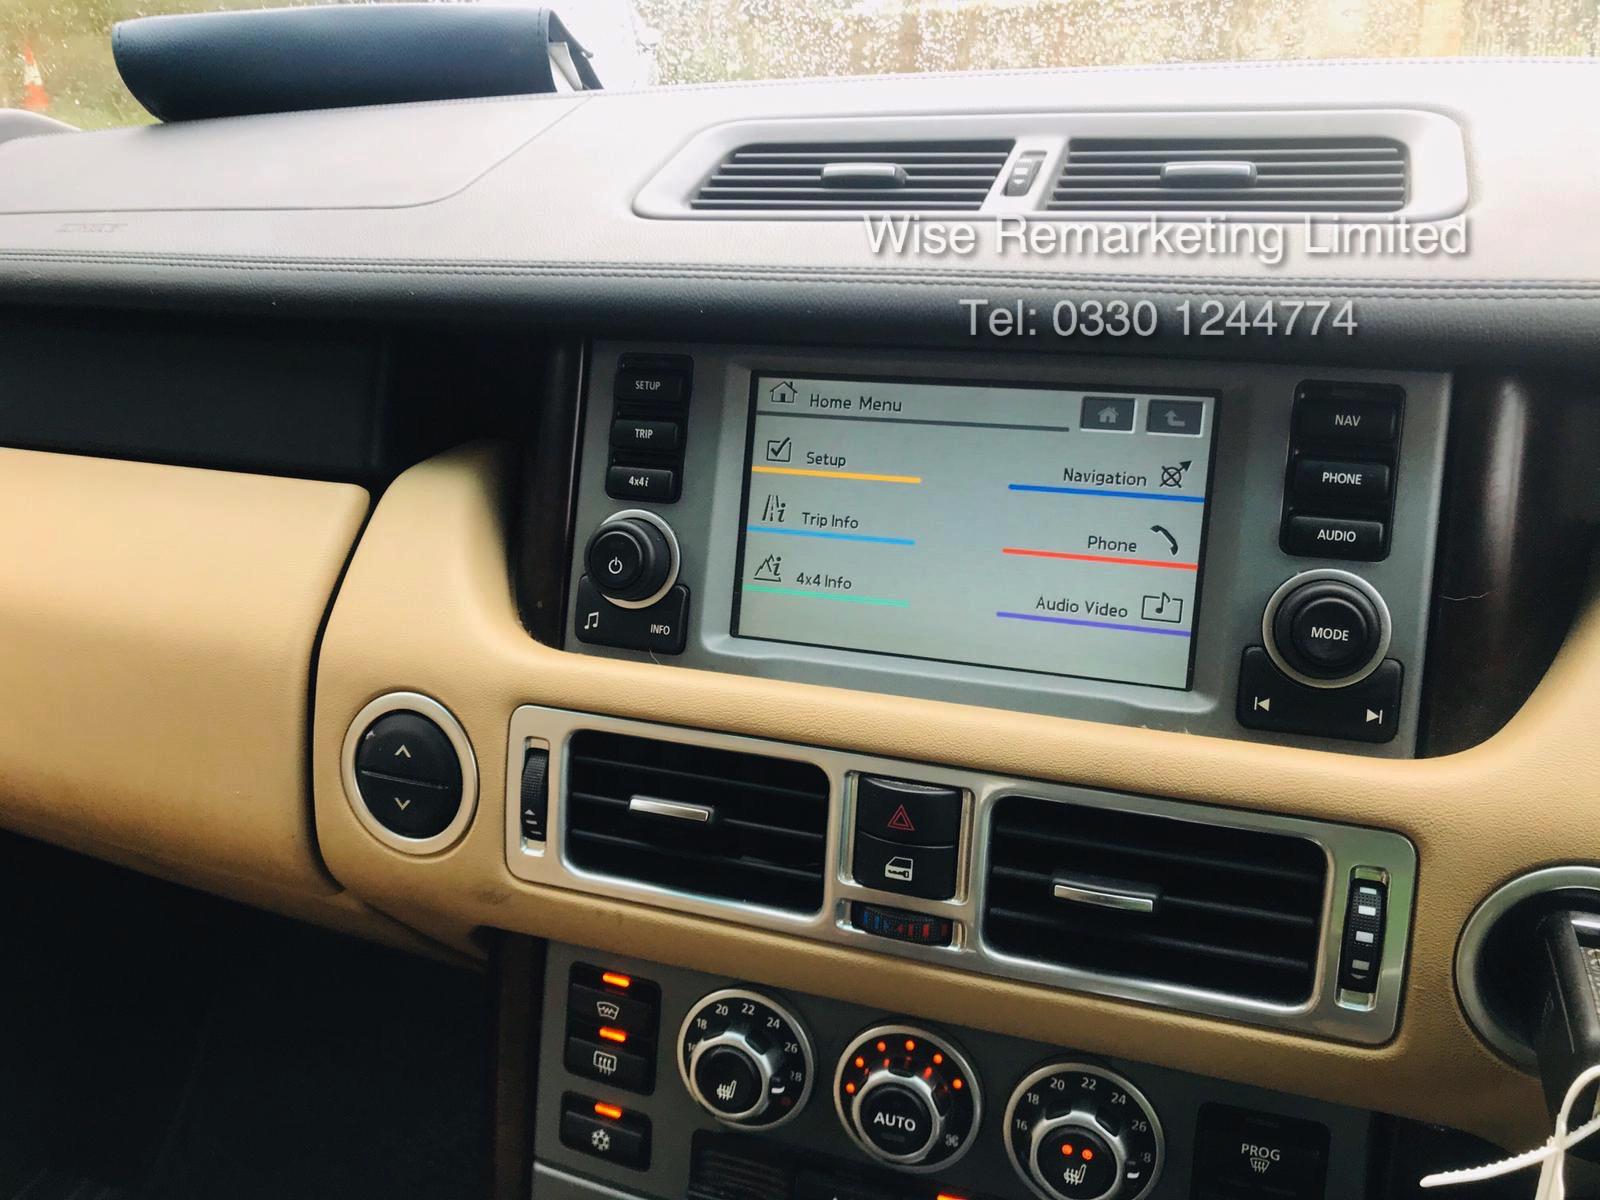 Range Rover Vogue 3.6 TDV8 HSE Auto - 2010 Model - Cream Leather - Service History - - Image 20 of 28